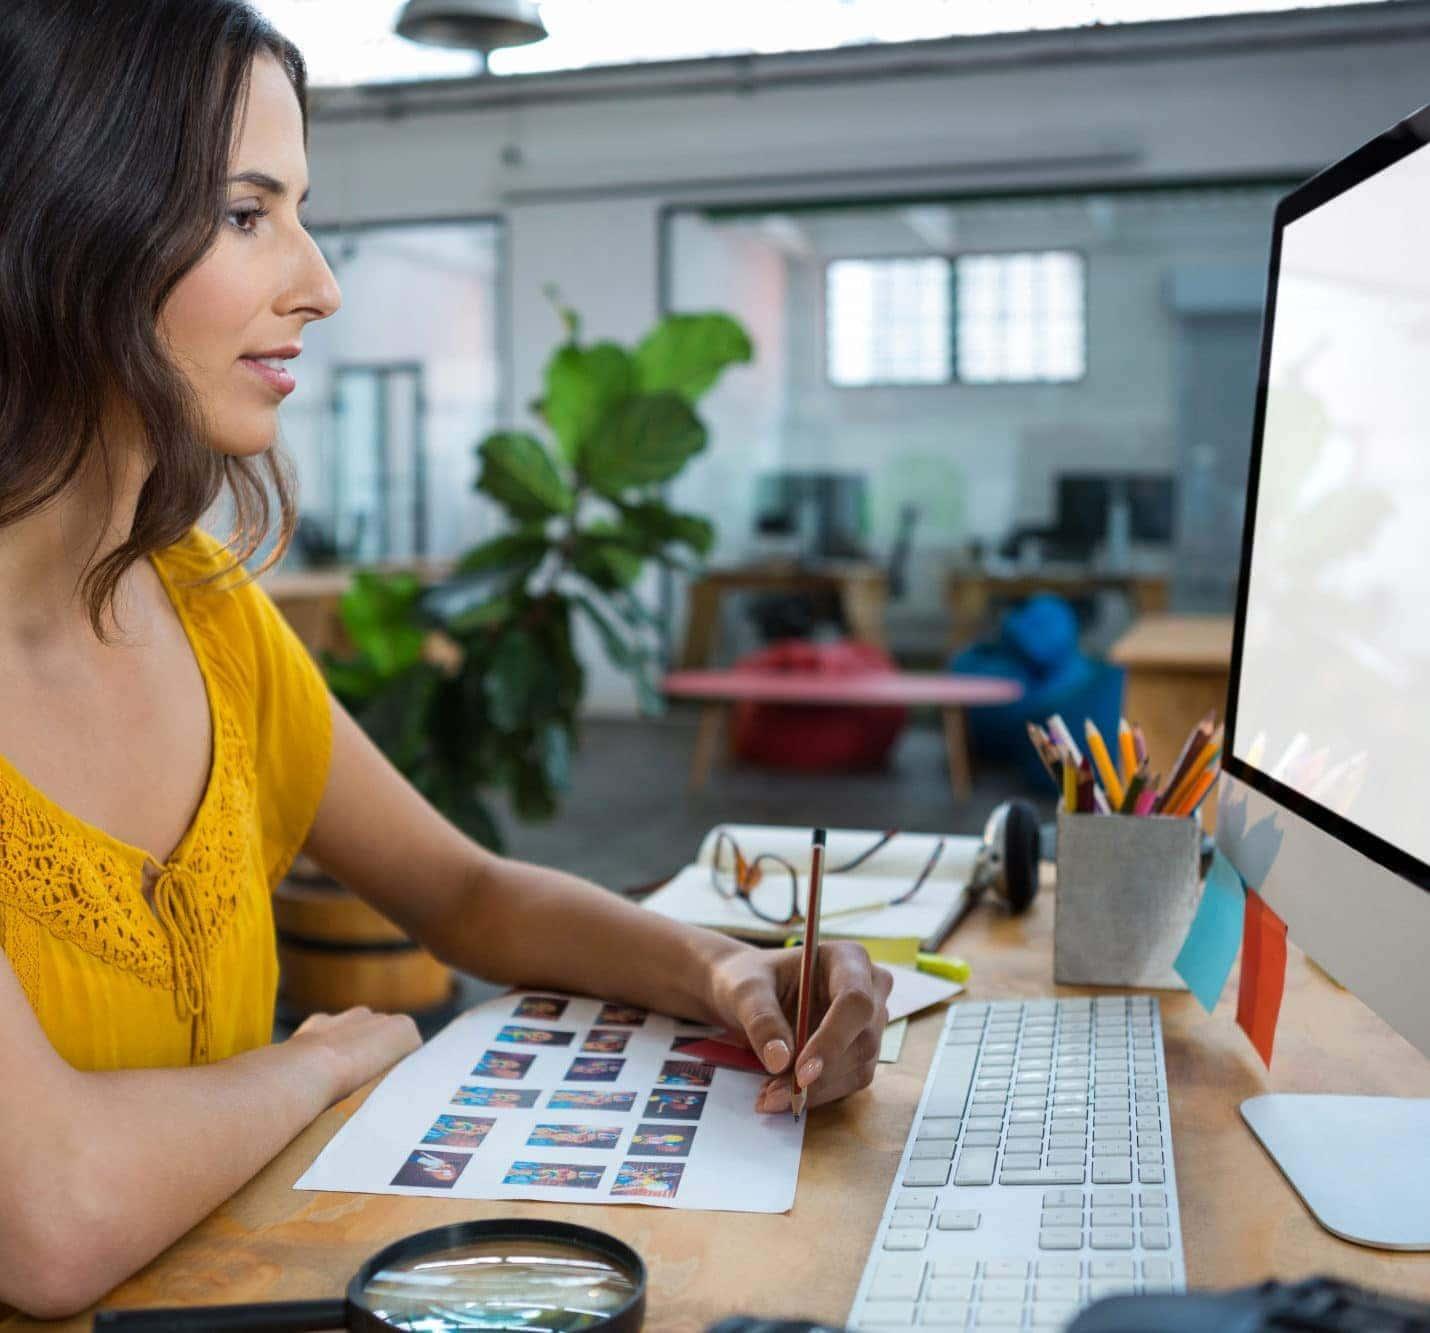 Web Design Frau mit Stift